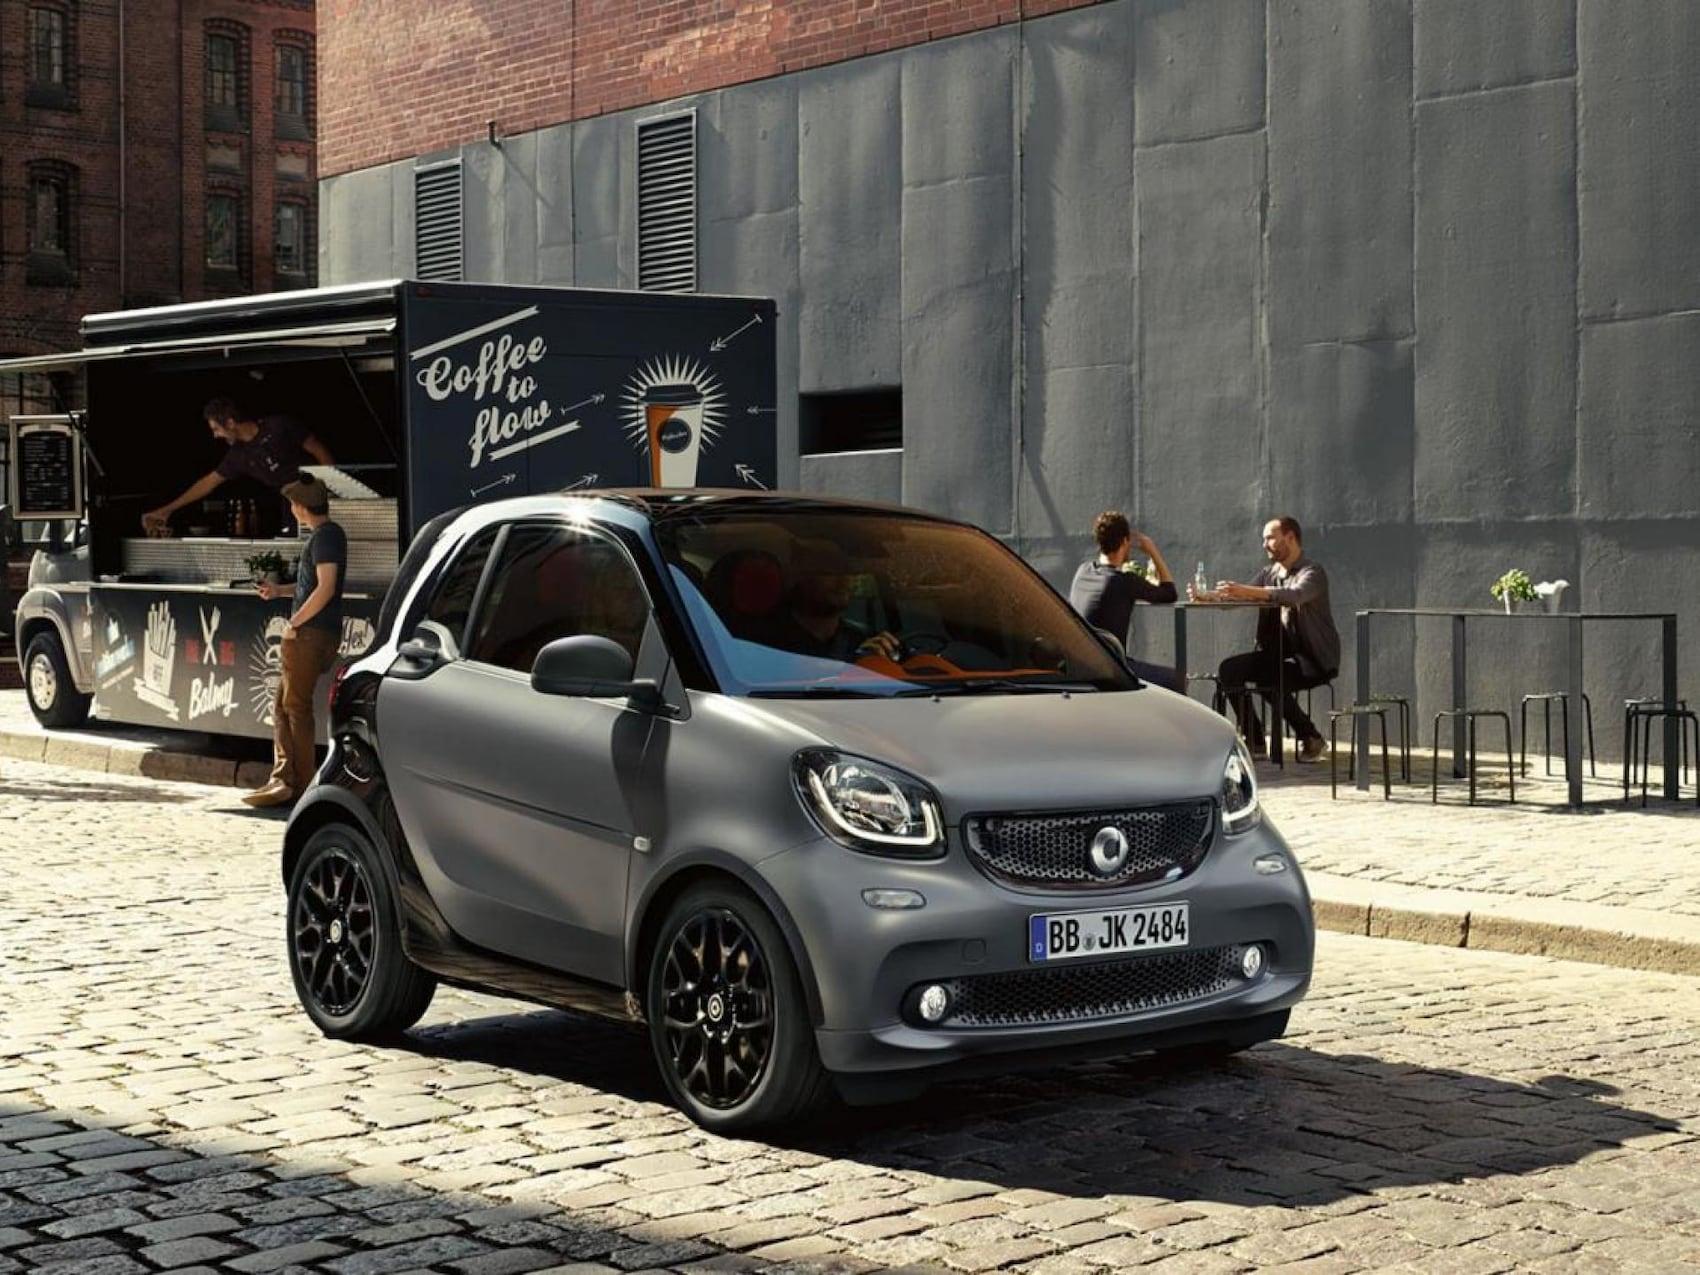 smart EQ fortwo coupé - design